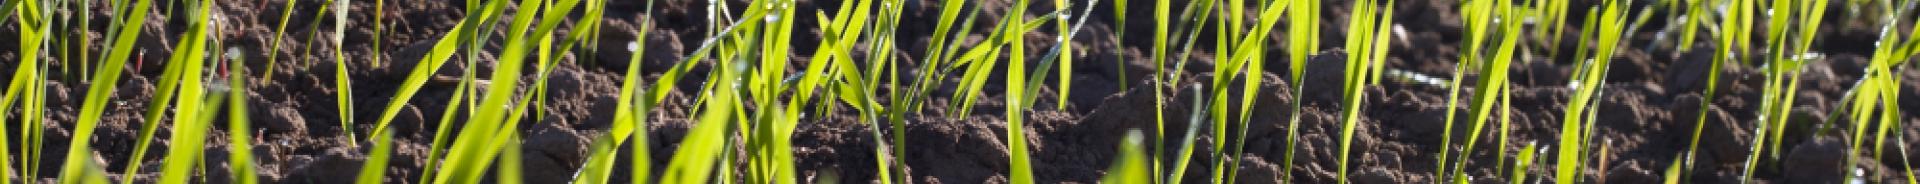 Scienze e Tecnologie Agrarie